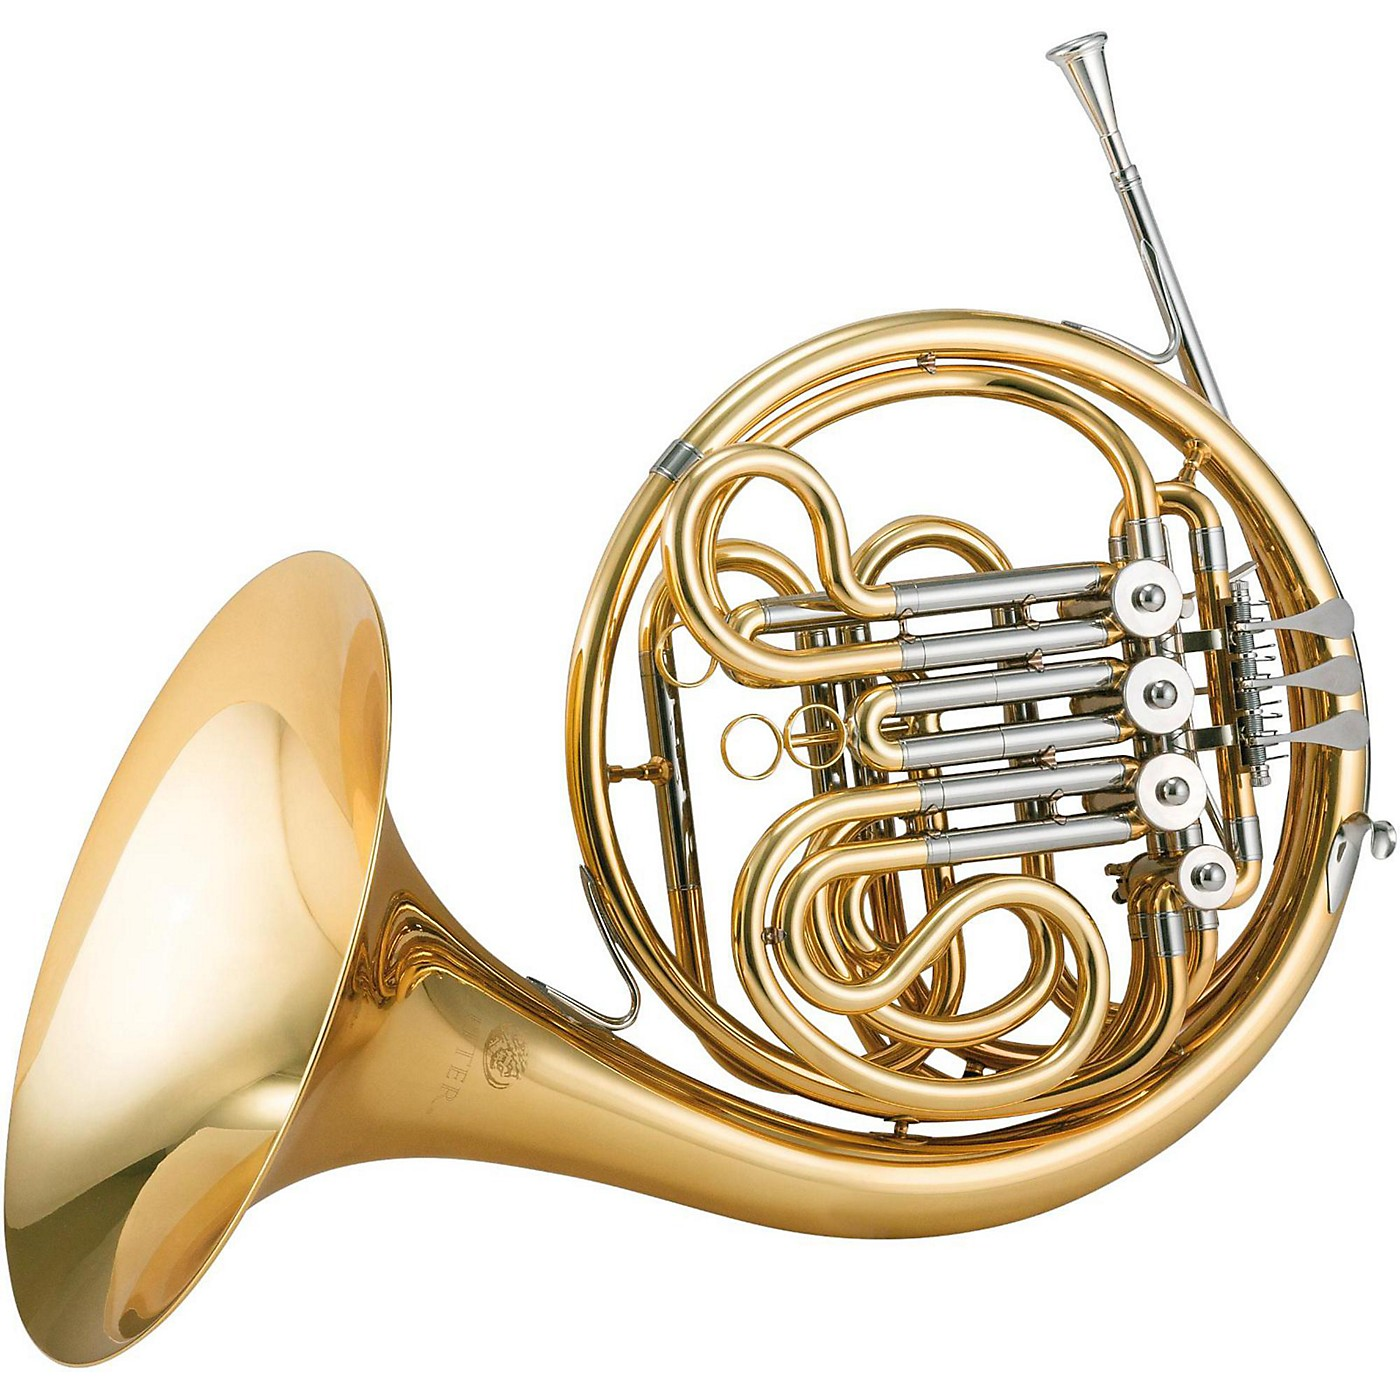 Jupiter JHR1110 Performance Series French Horn thumbnail